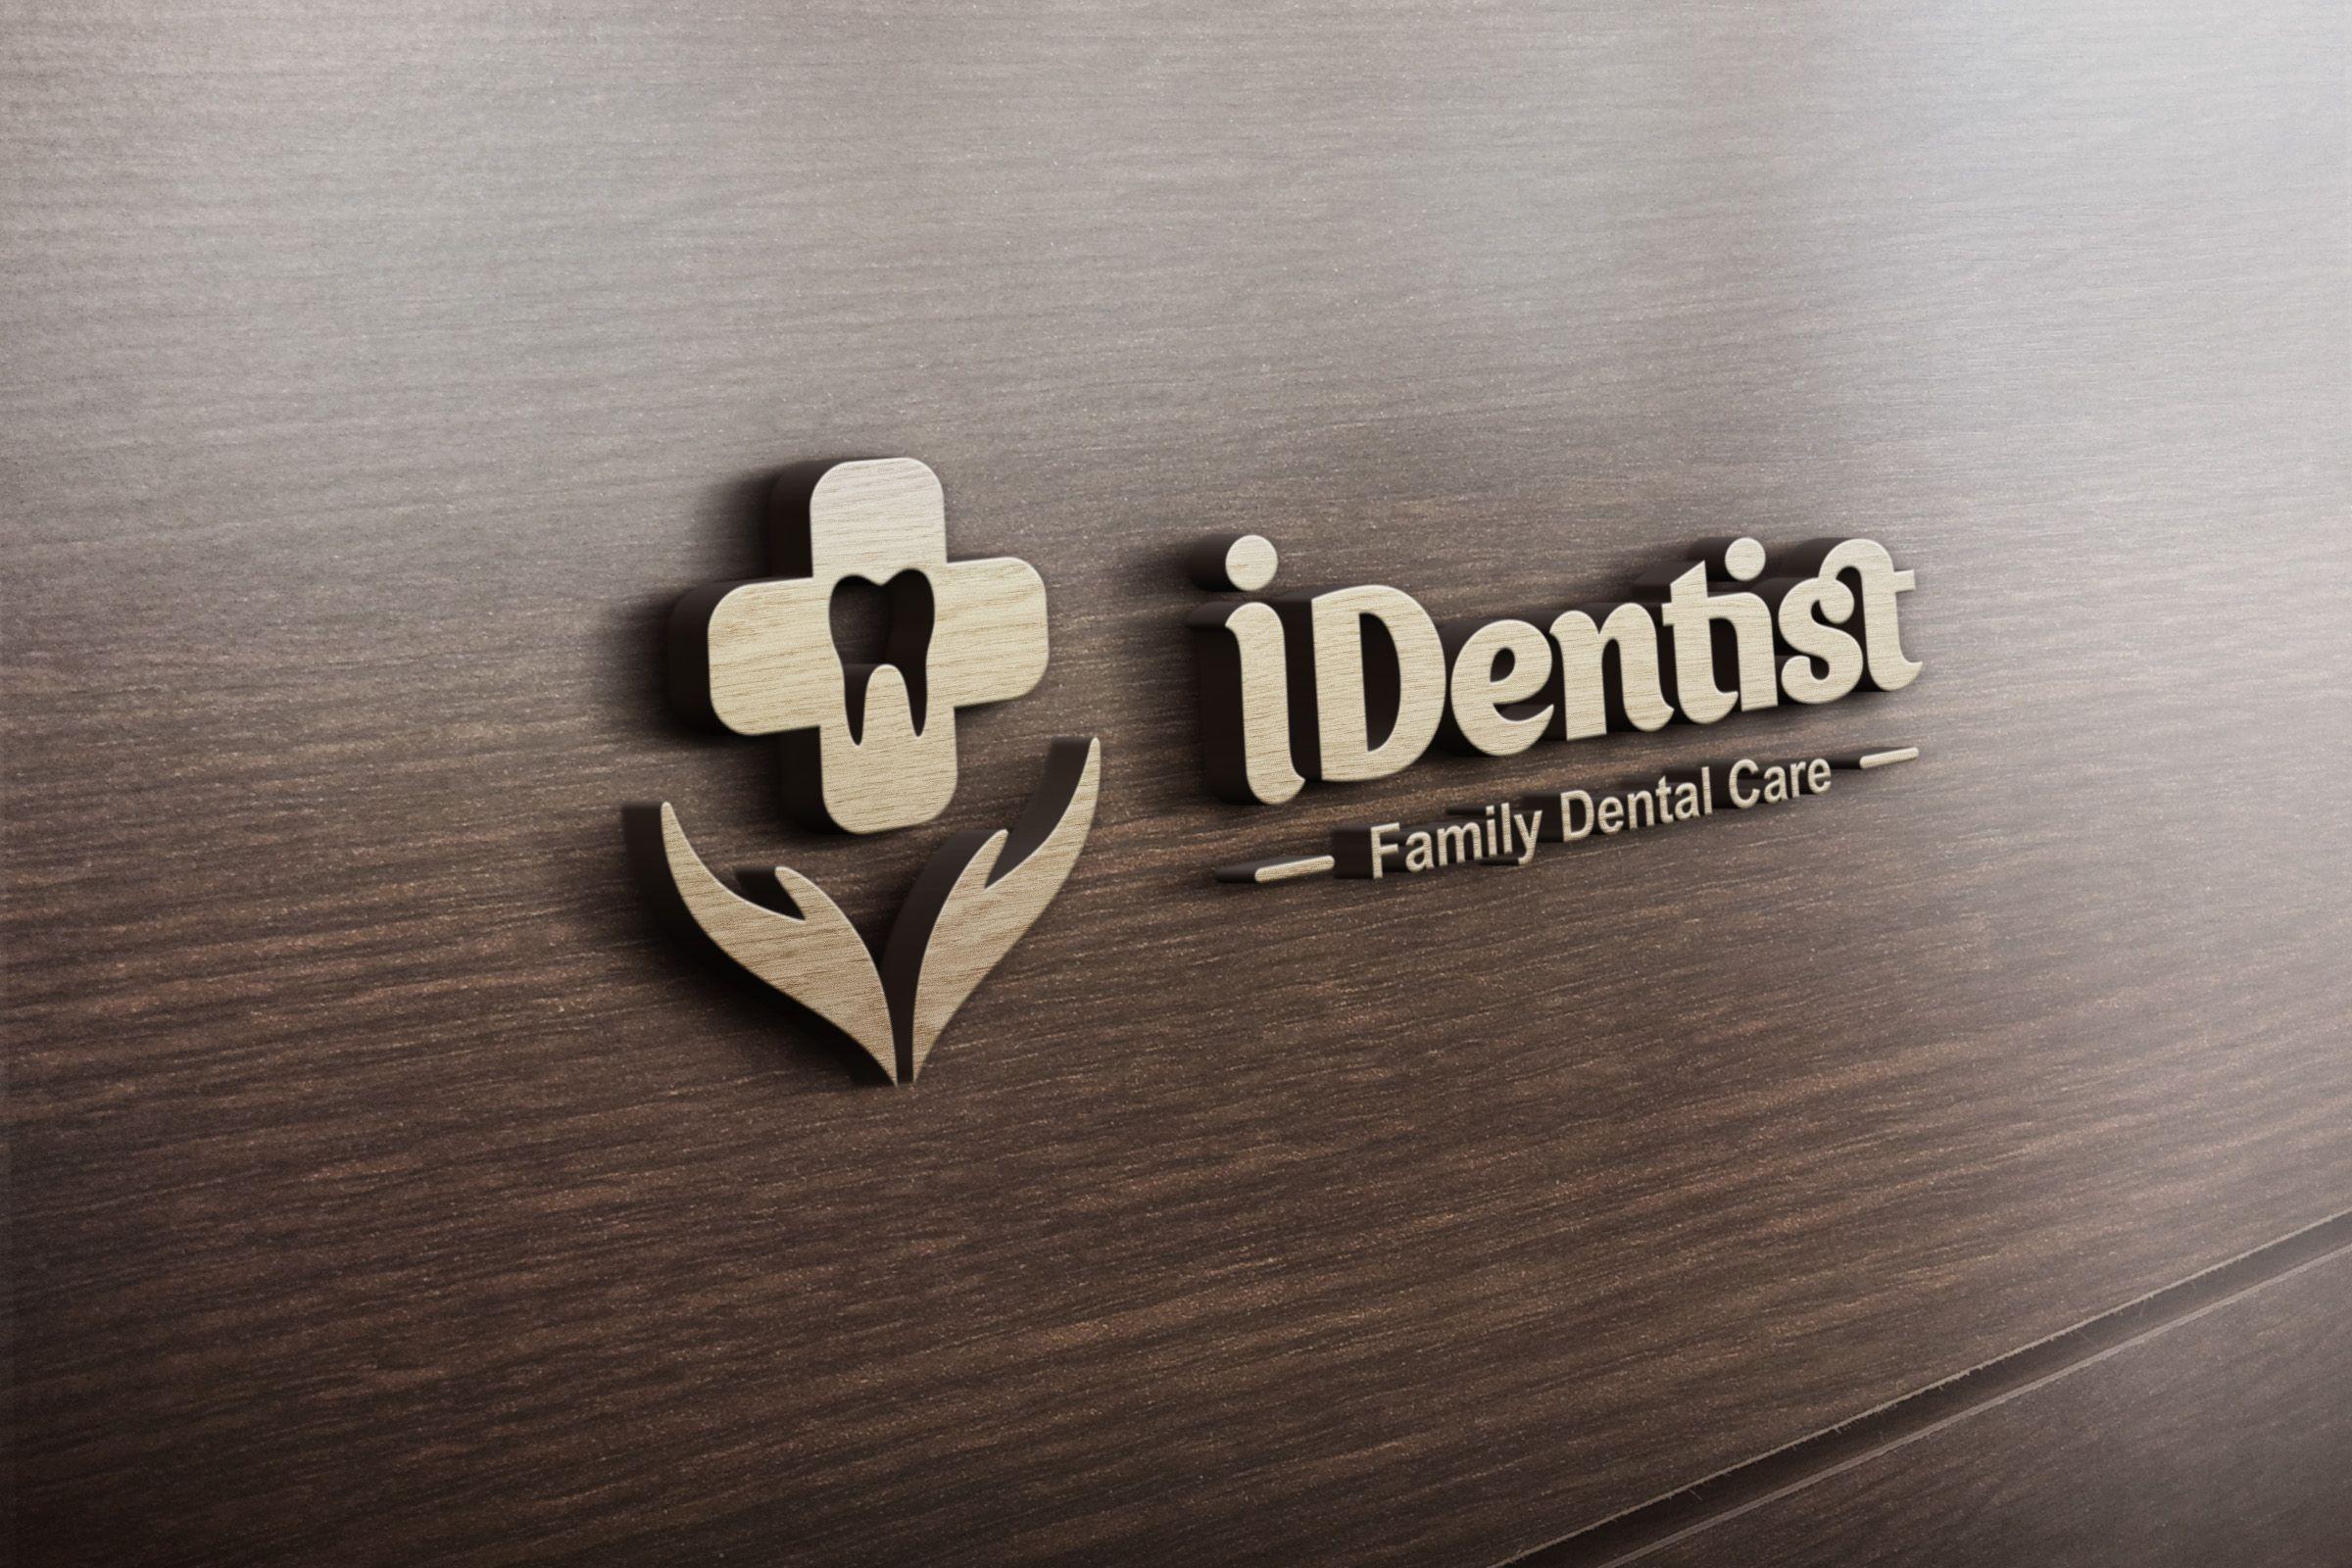 A family dental clinics logo @Tangsel | Hanya Hoby | Pinterest